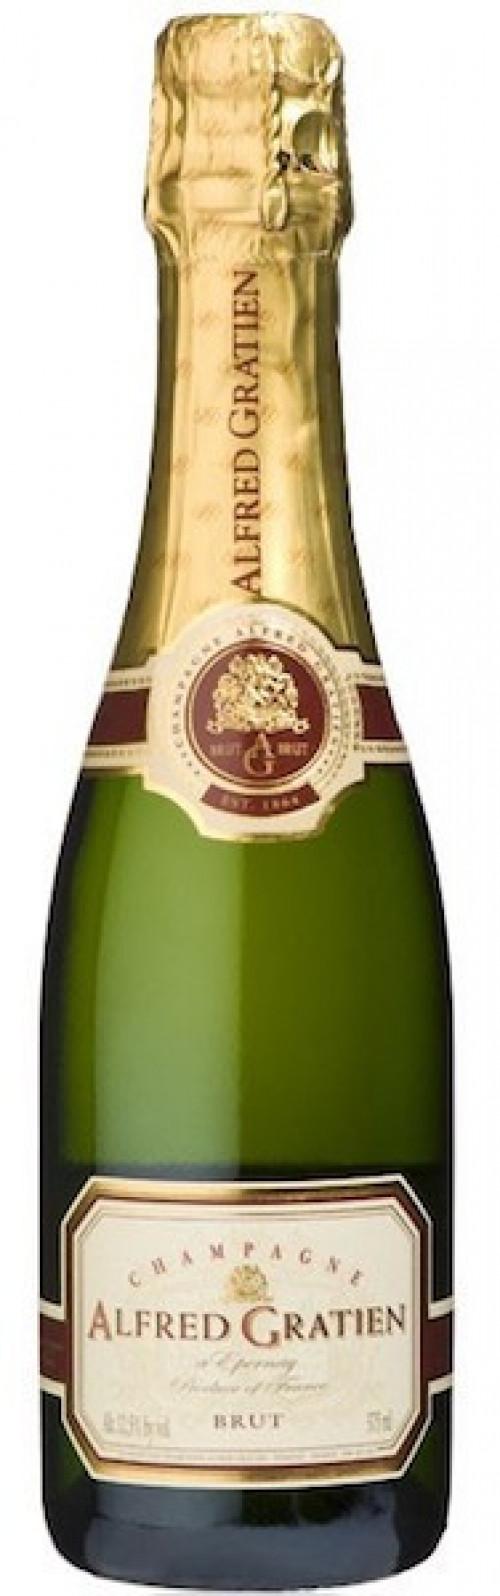 Alfred Gratien Brut Champagne 750ml